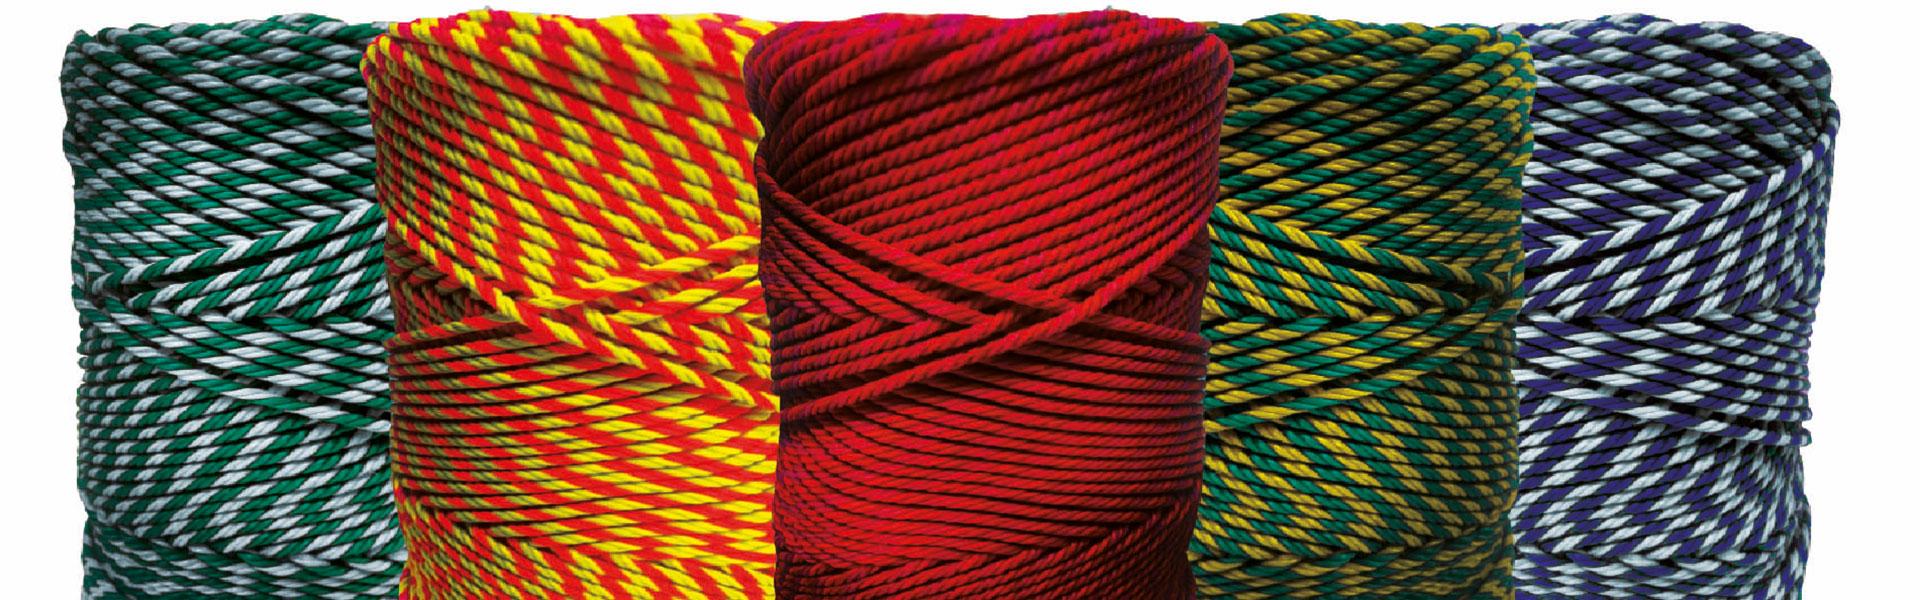 venta-sogas-multiuso-en-bolivia